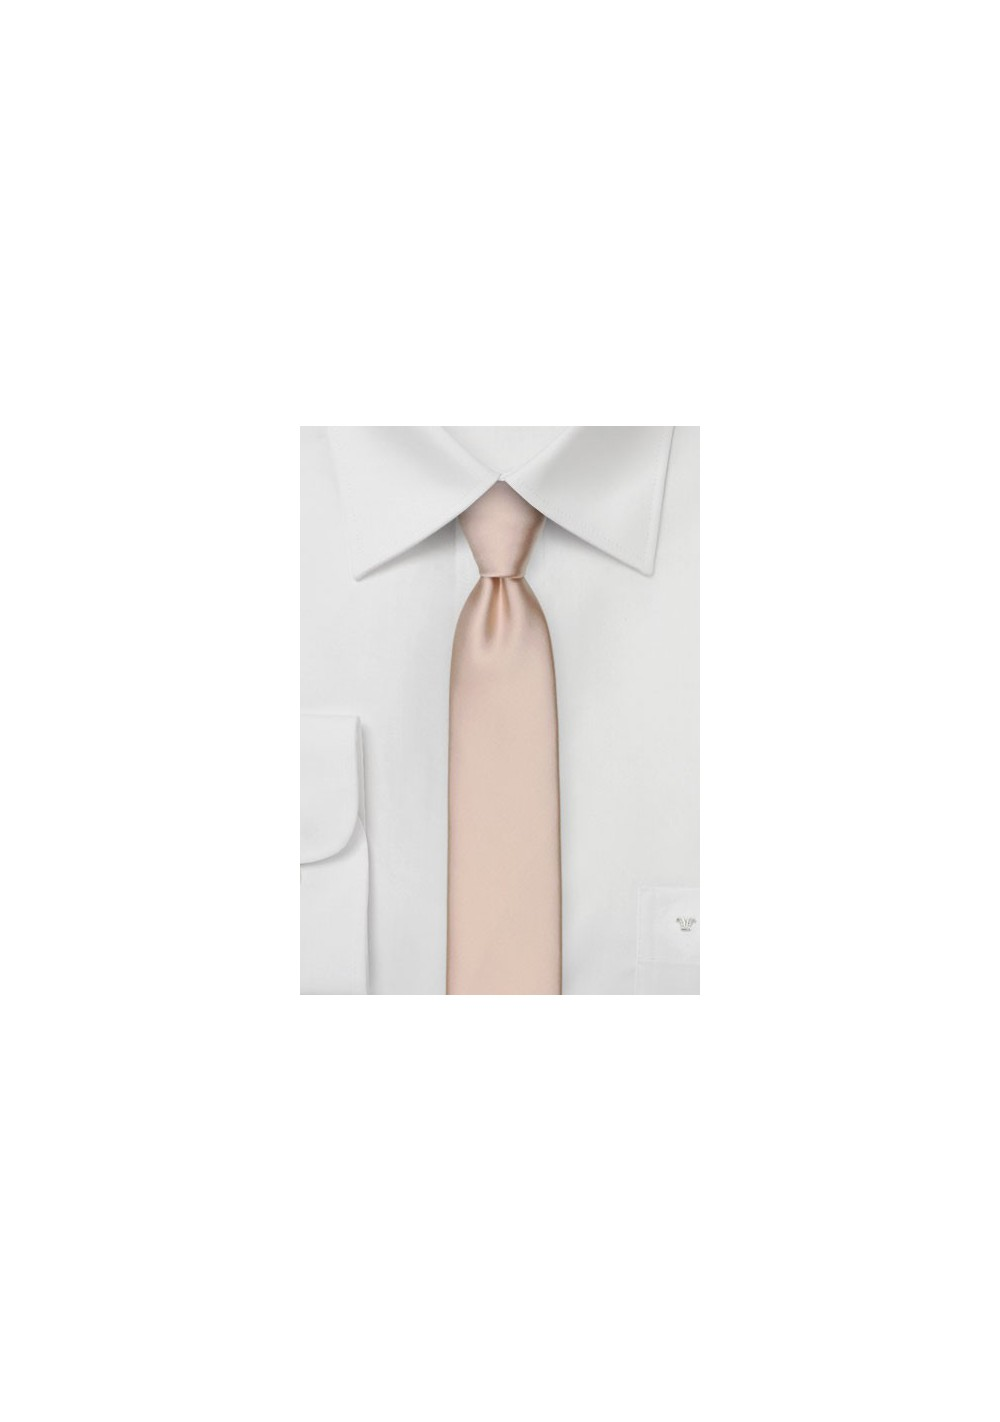 Skinny Tie in Antique Blush